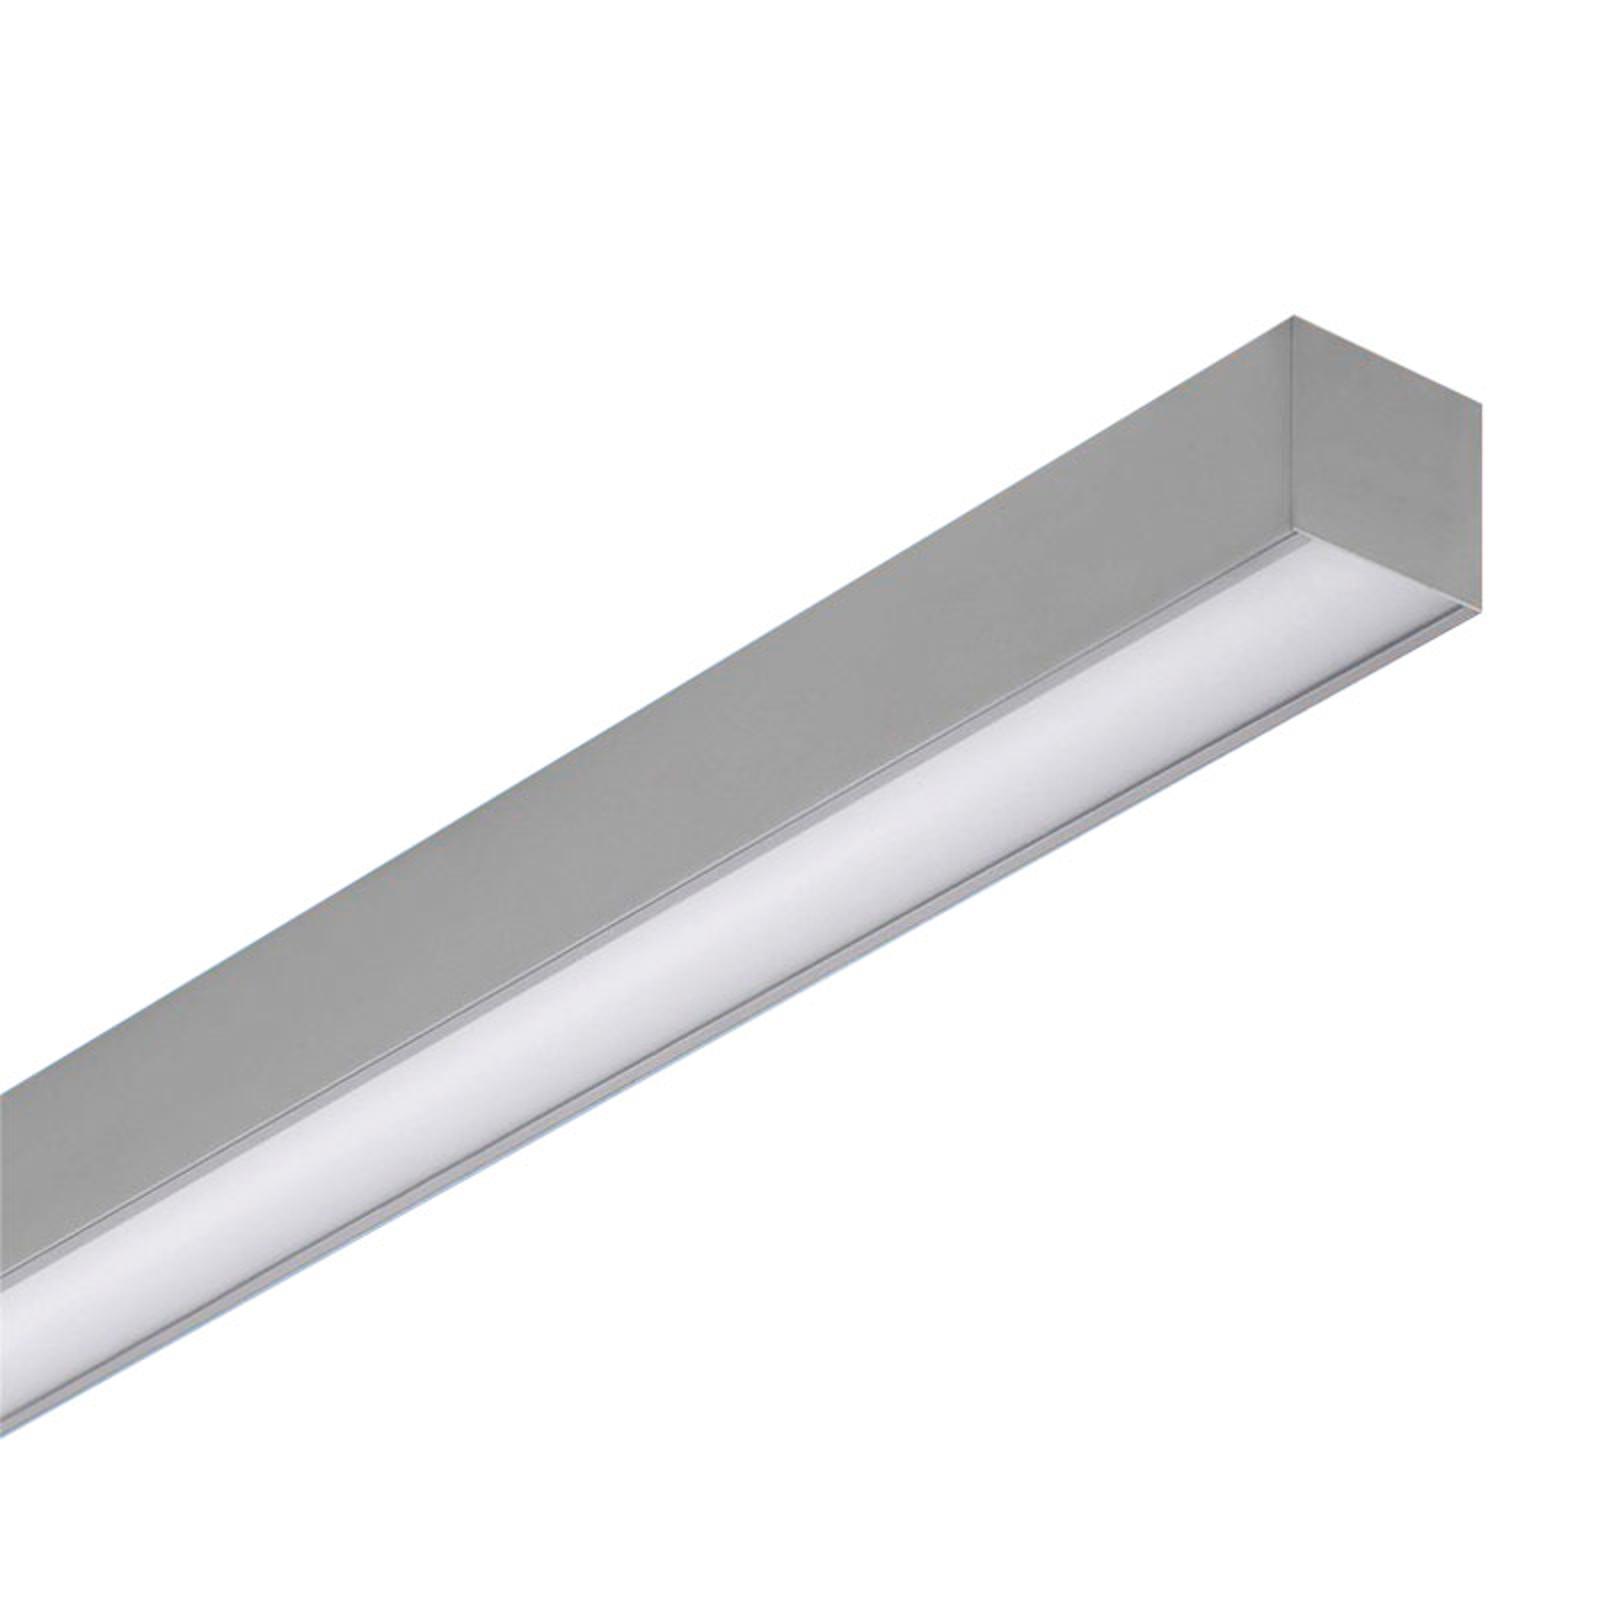 Applique a LED esterna LKPW075 efficiente, 3000K